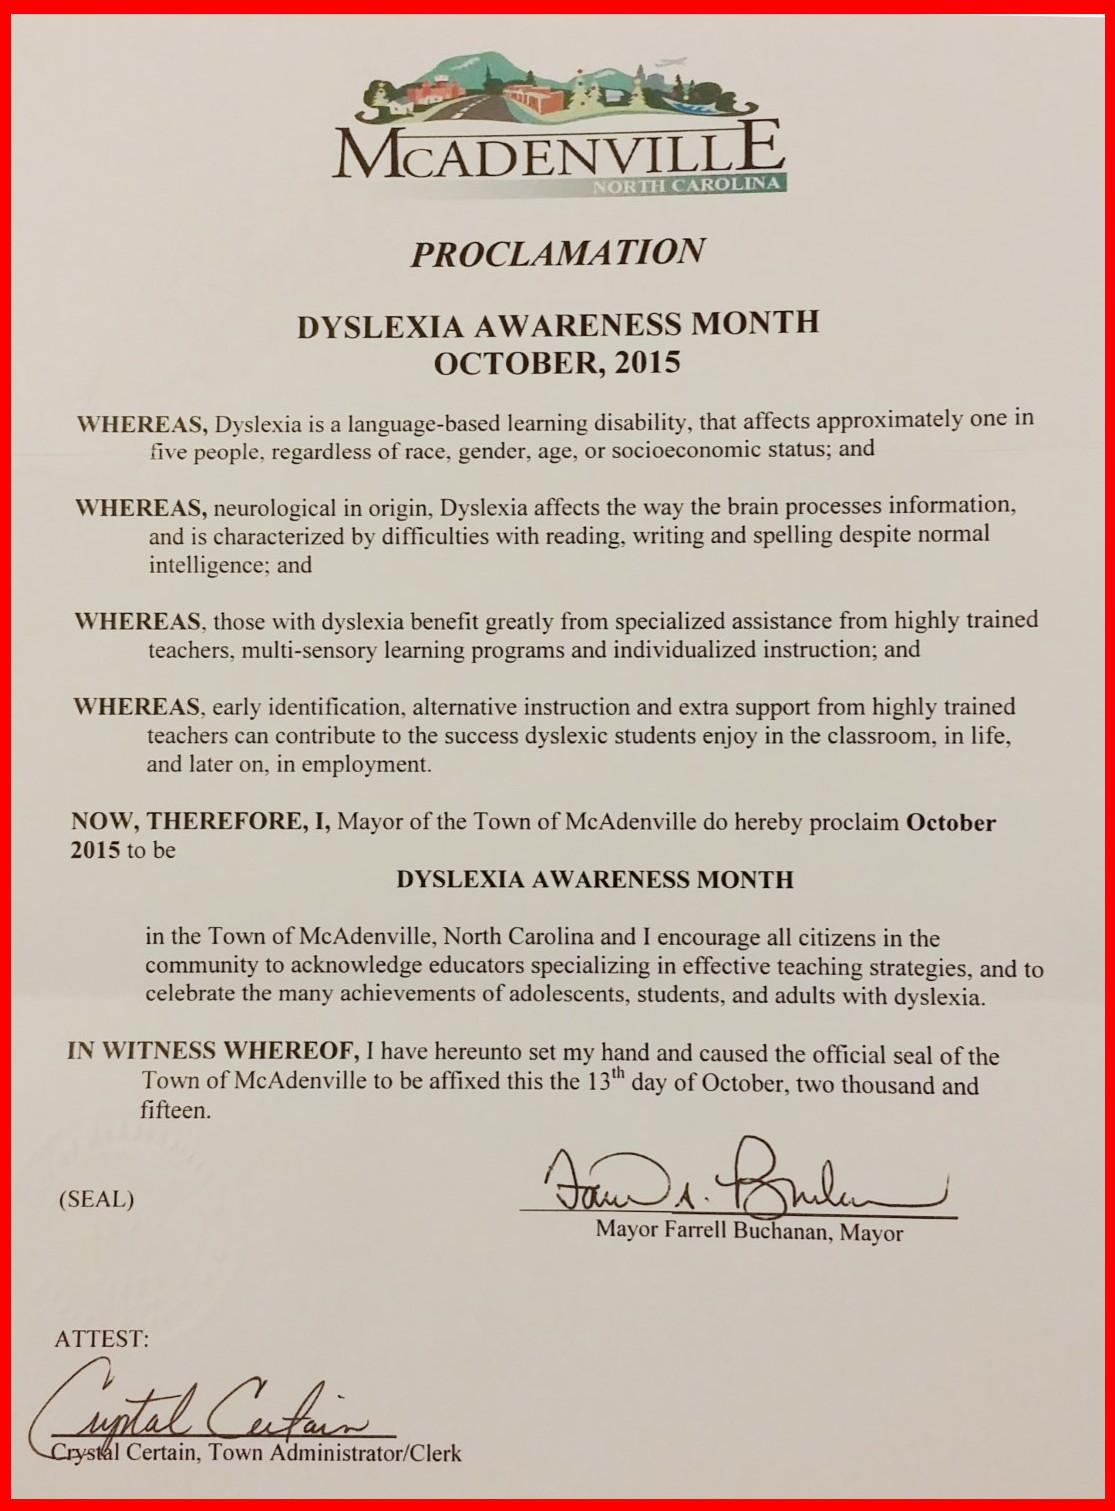 McAdenville Proclamation